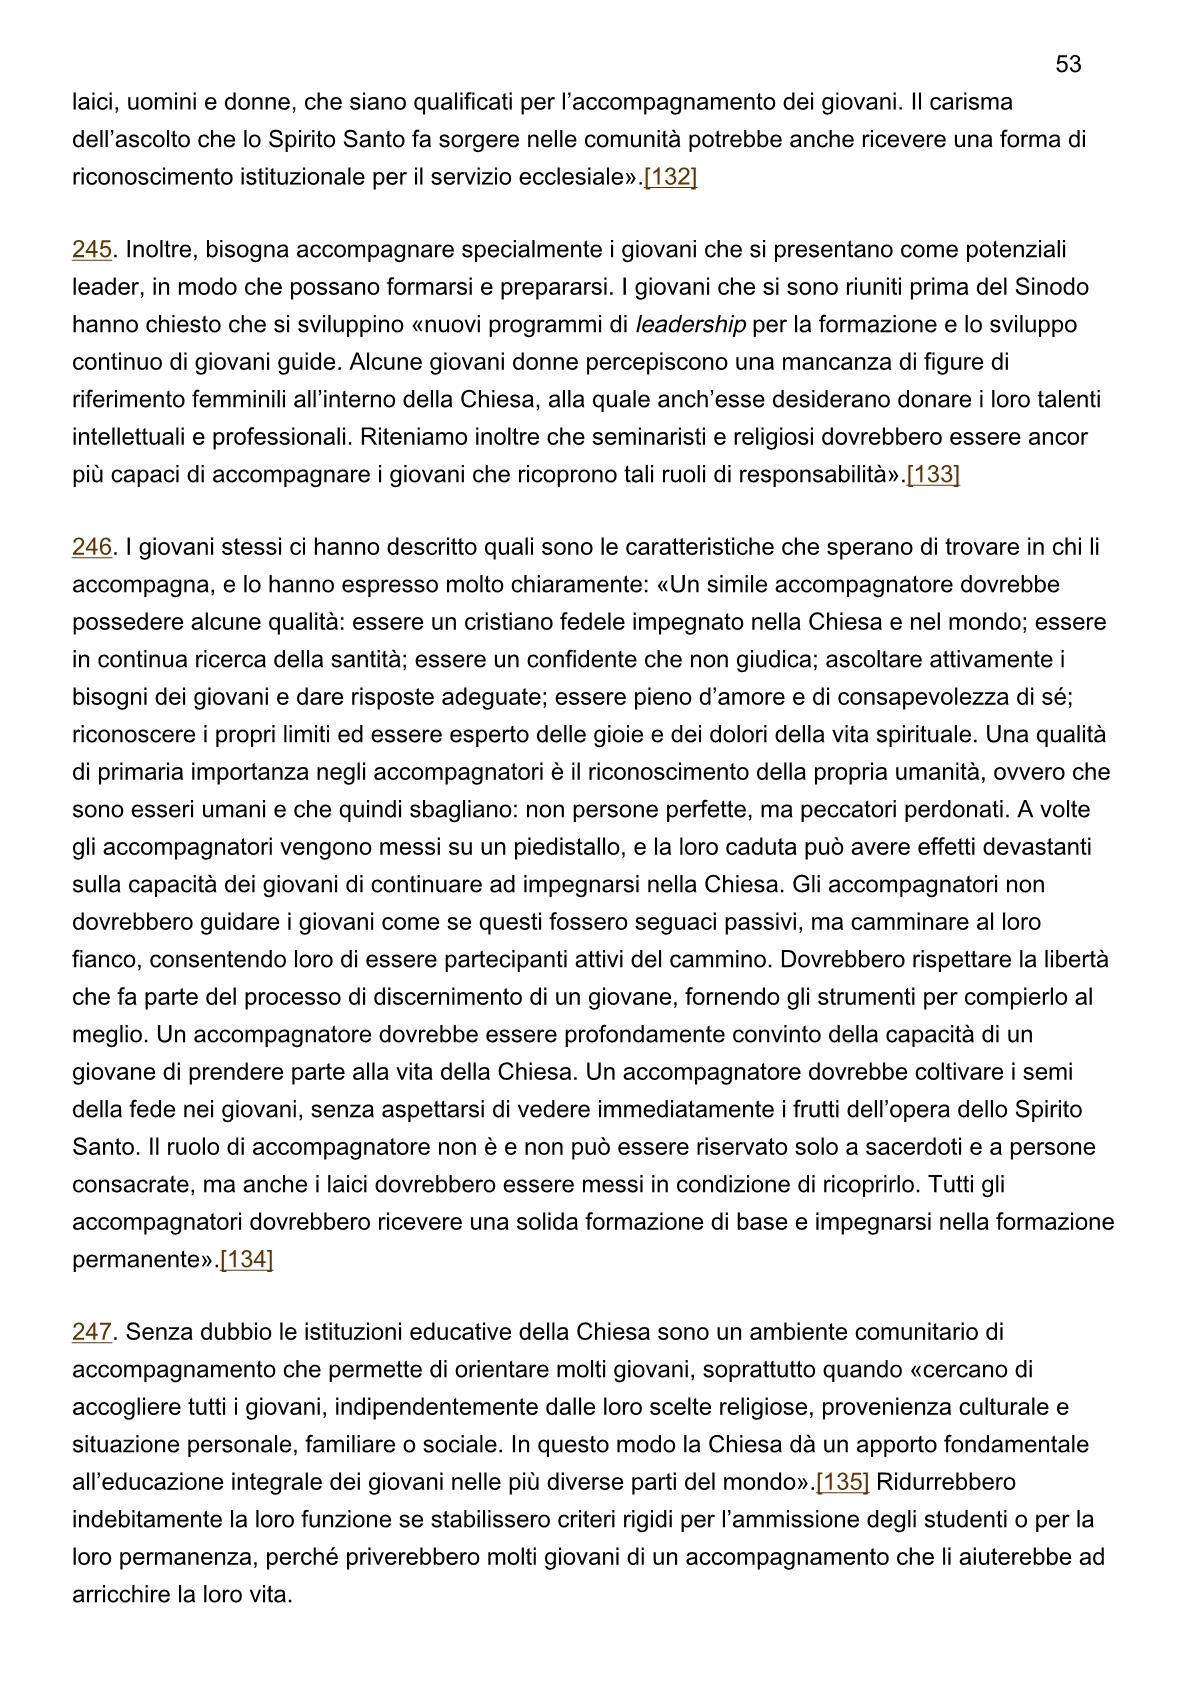 papa-francesco_esortazione-ap_20190325_christus-vivit53